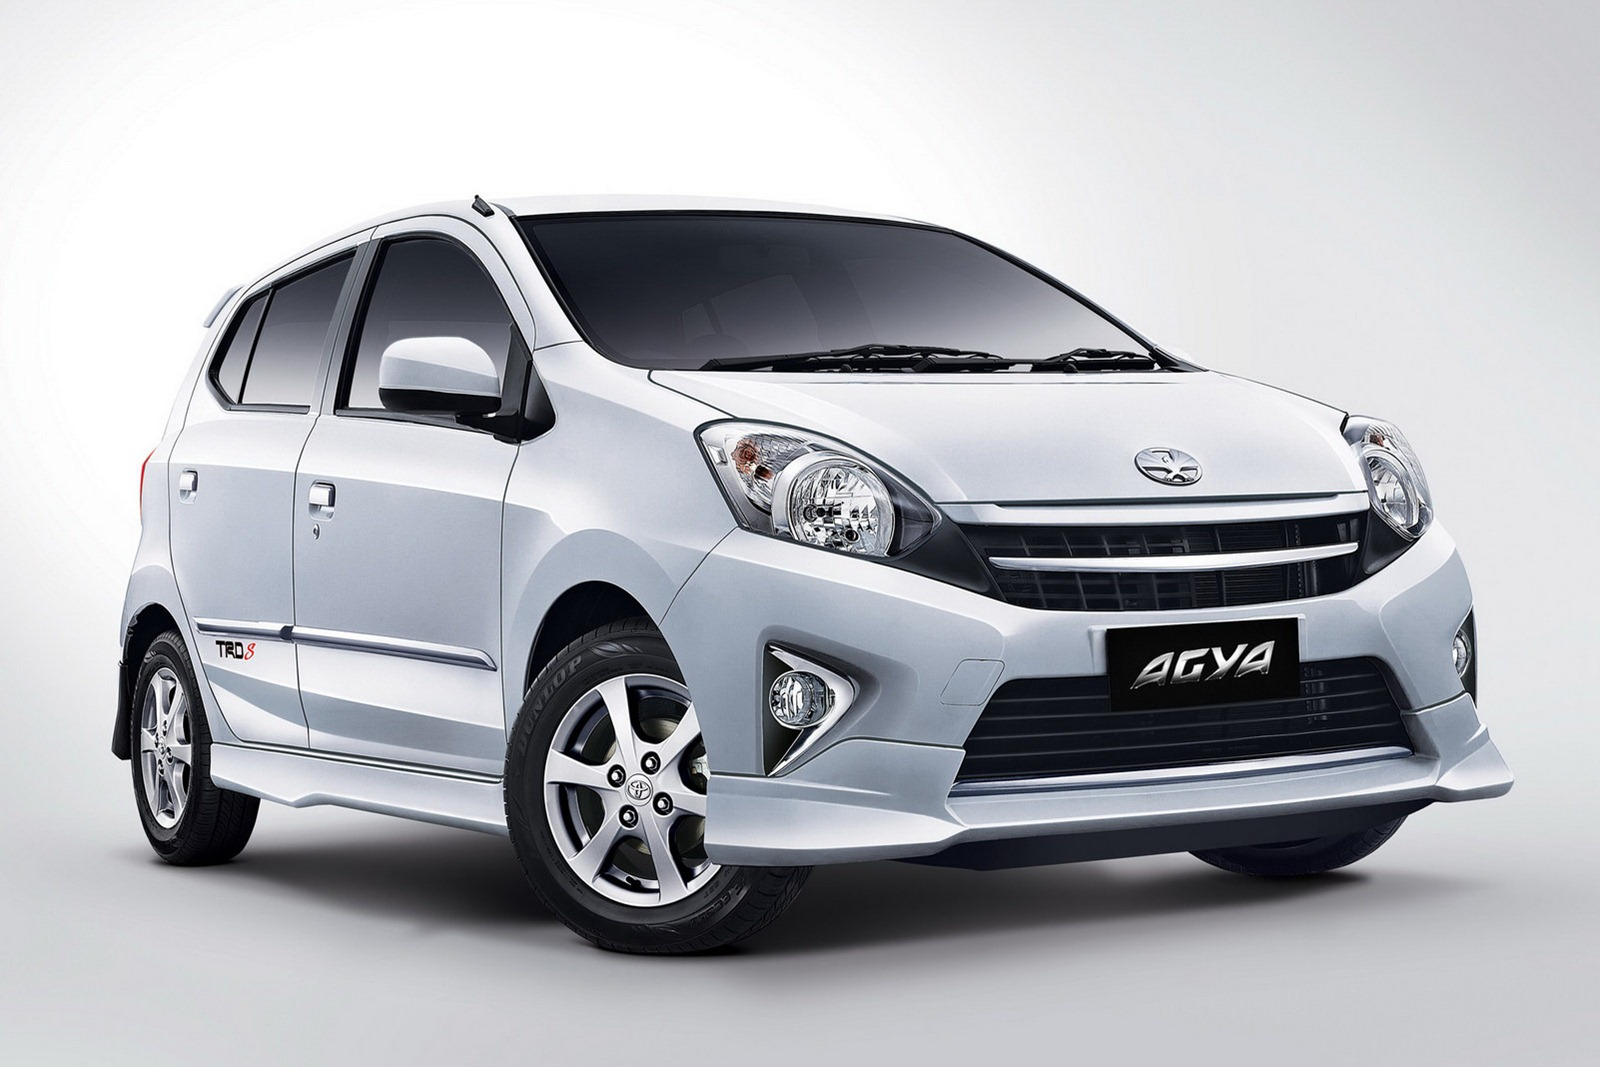 Kumpulan Gambar Mobil Toyota Agya Dan Daihatsu Ayla